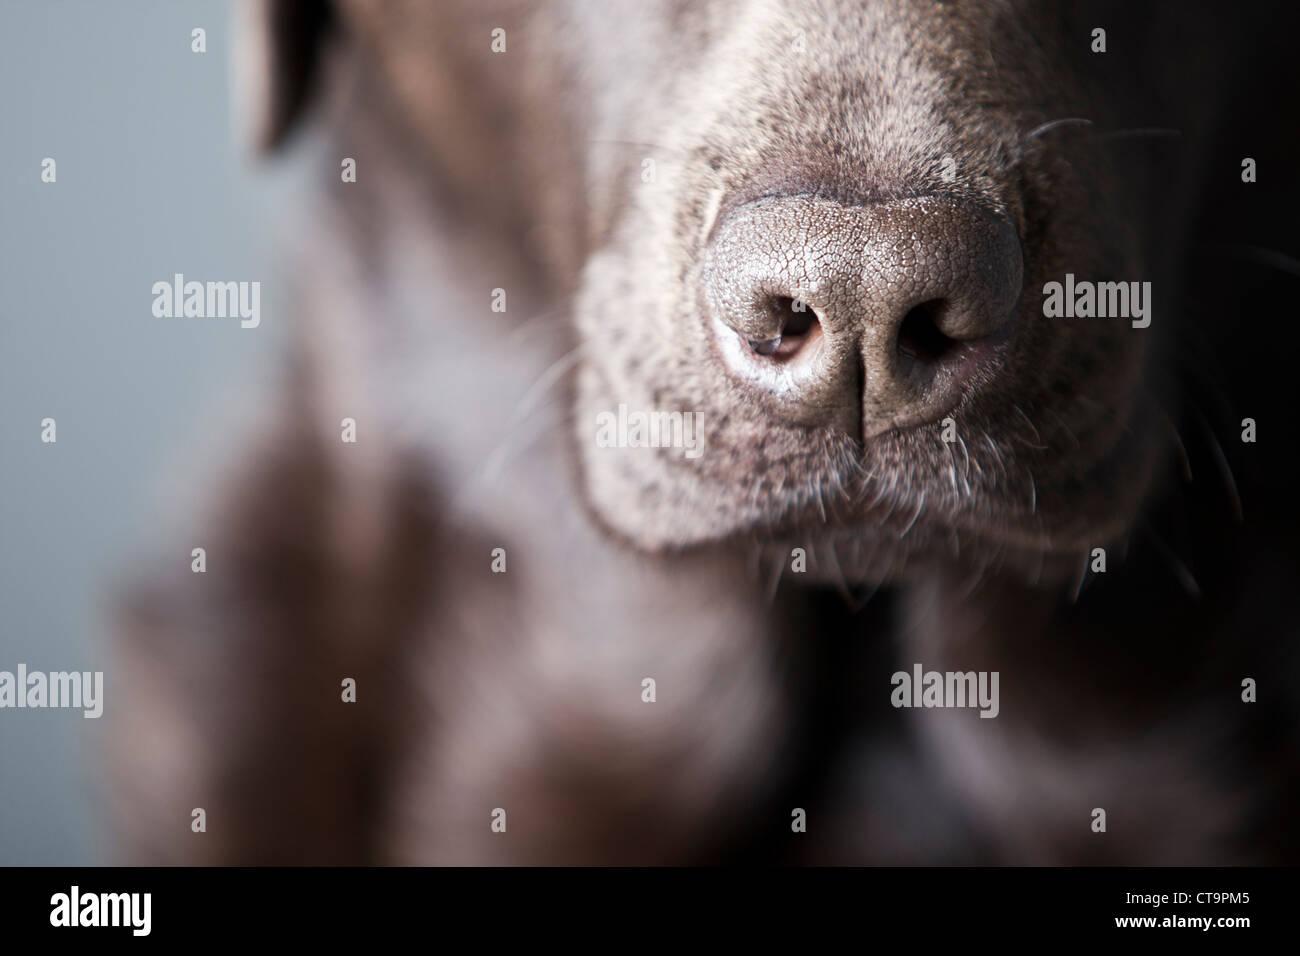 Close up of Labrador's Nose - moisture droplet on nostril - Stock Image